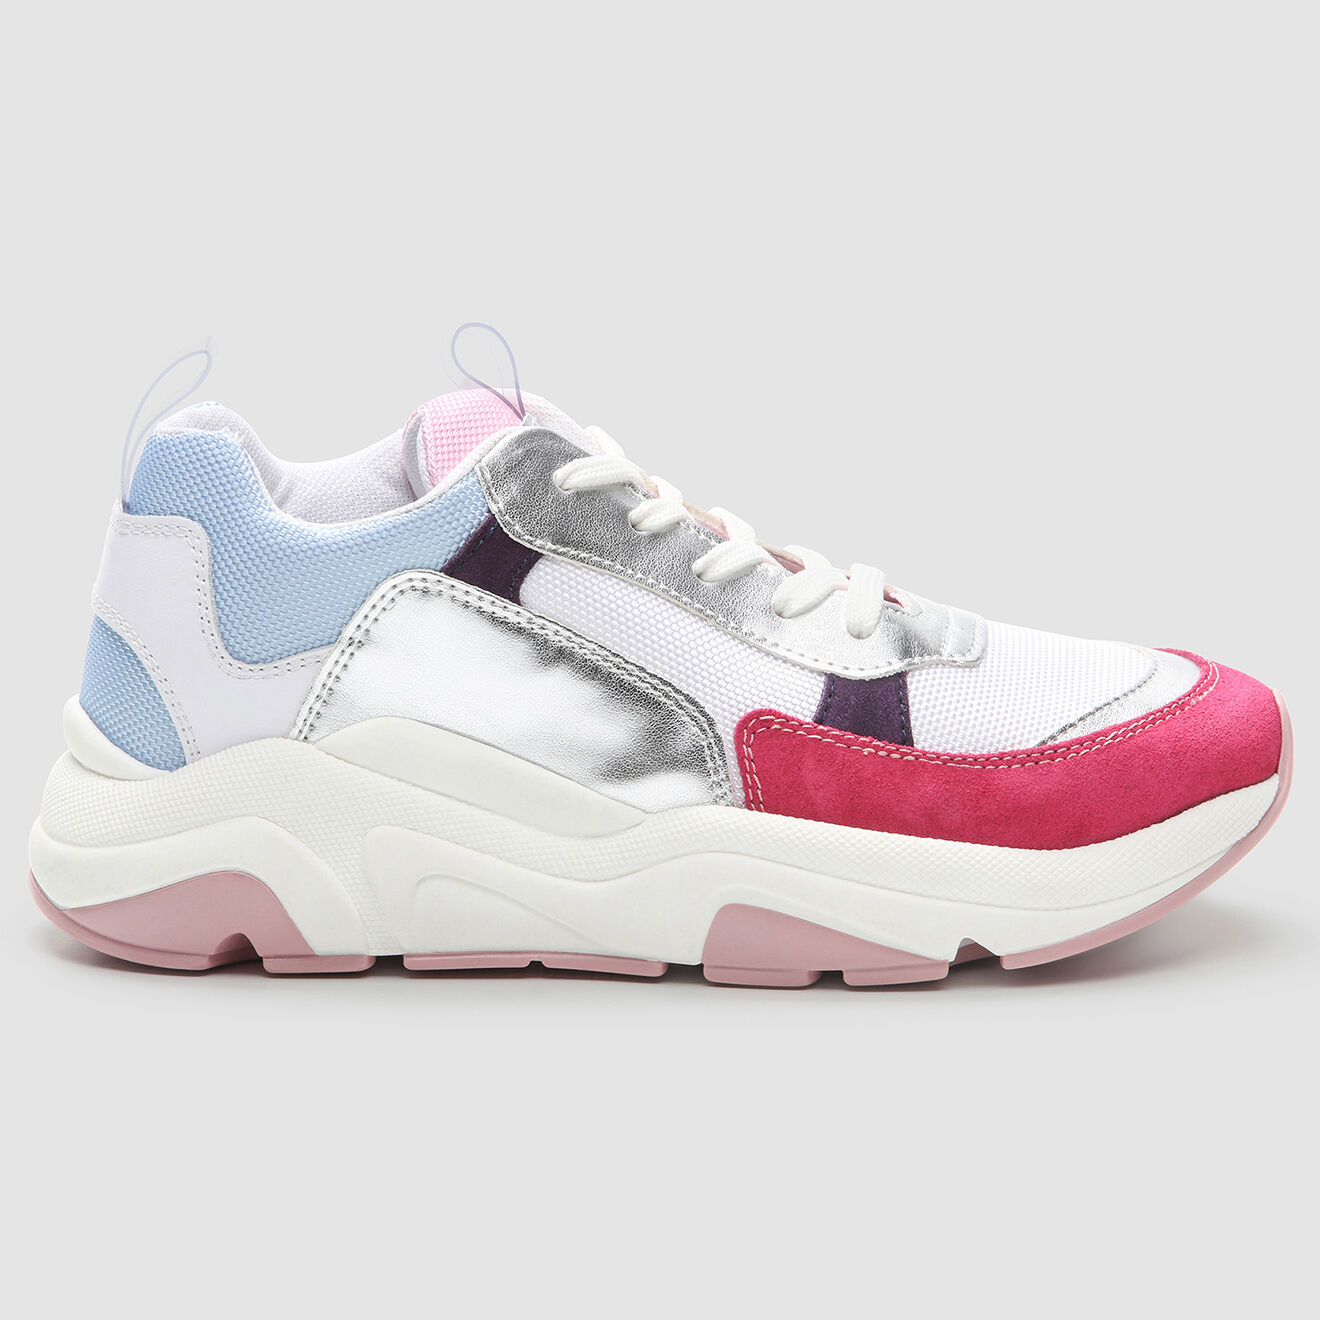 Sneakers en Cuir & Textile Beloa blanc/rose/bleu - Cosmoparis - Modalova